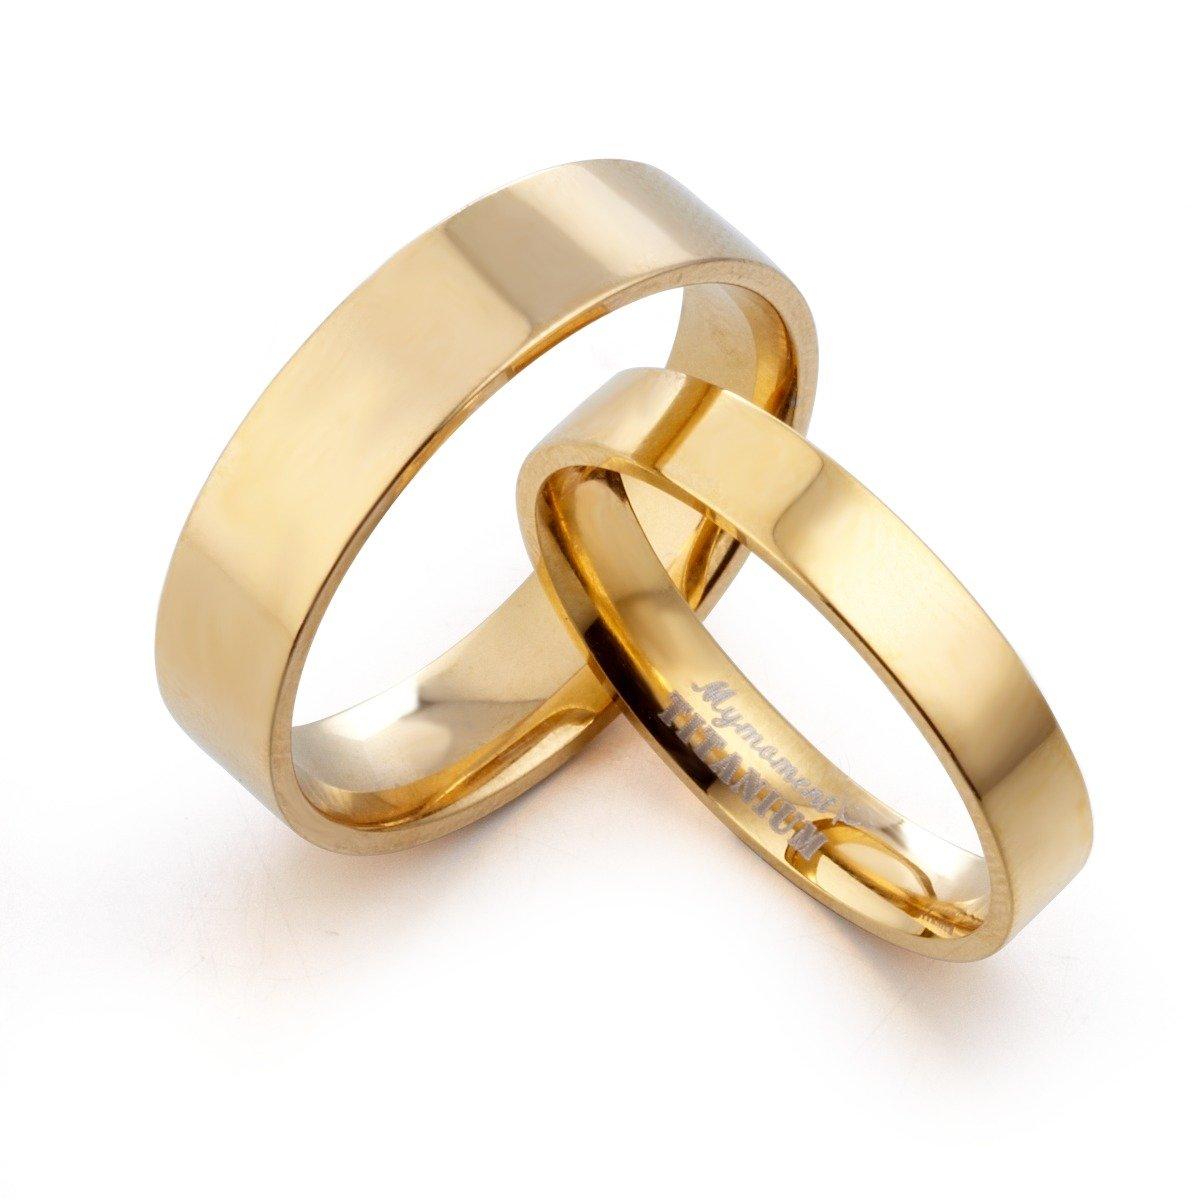 Gemini Groom /& Bride Matching 18K Gold Filled Anniversary Wedding Titanium Rings Set Width 6mm /& 4mm Men Ring Size 14 Women Ring Size 8